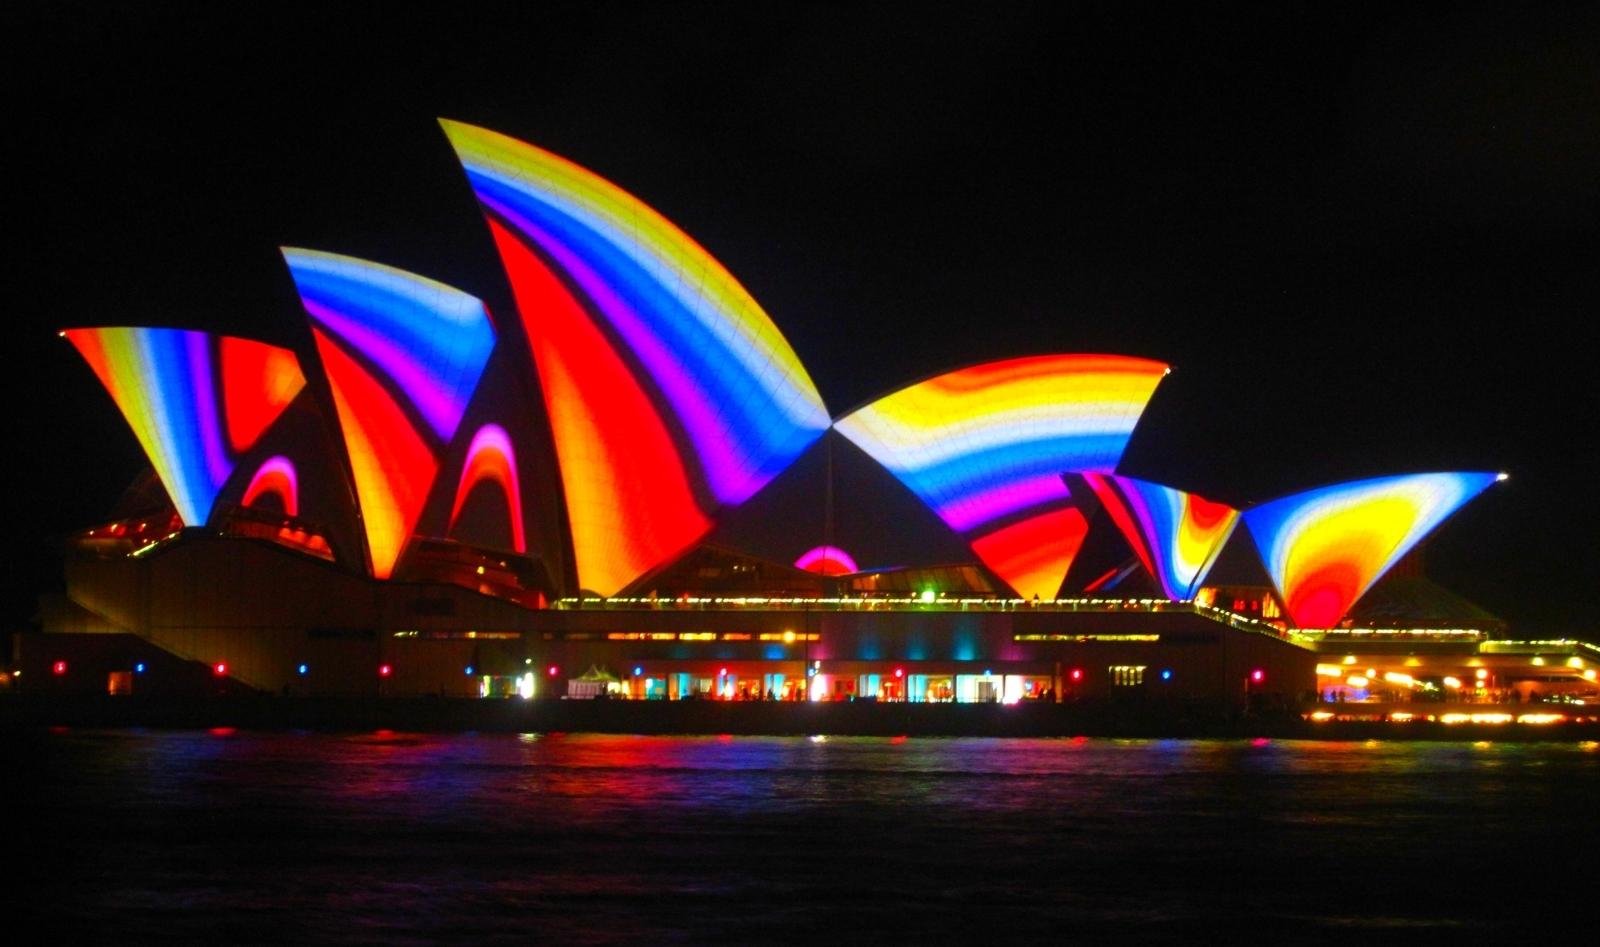 Sydney Vivid Festival image